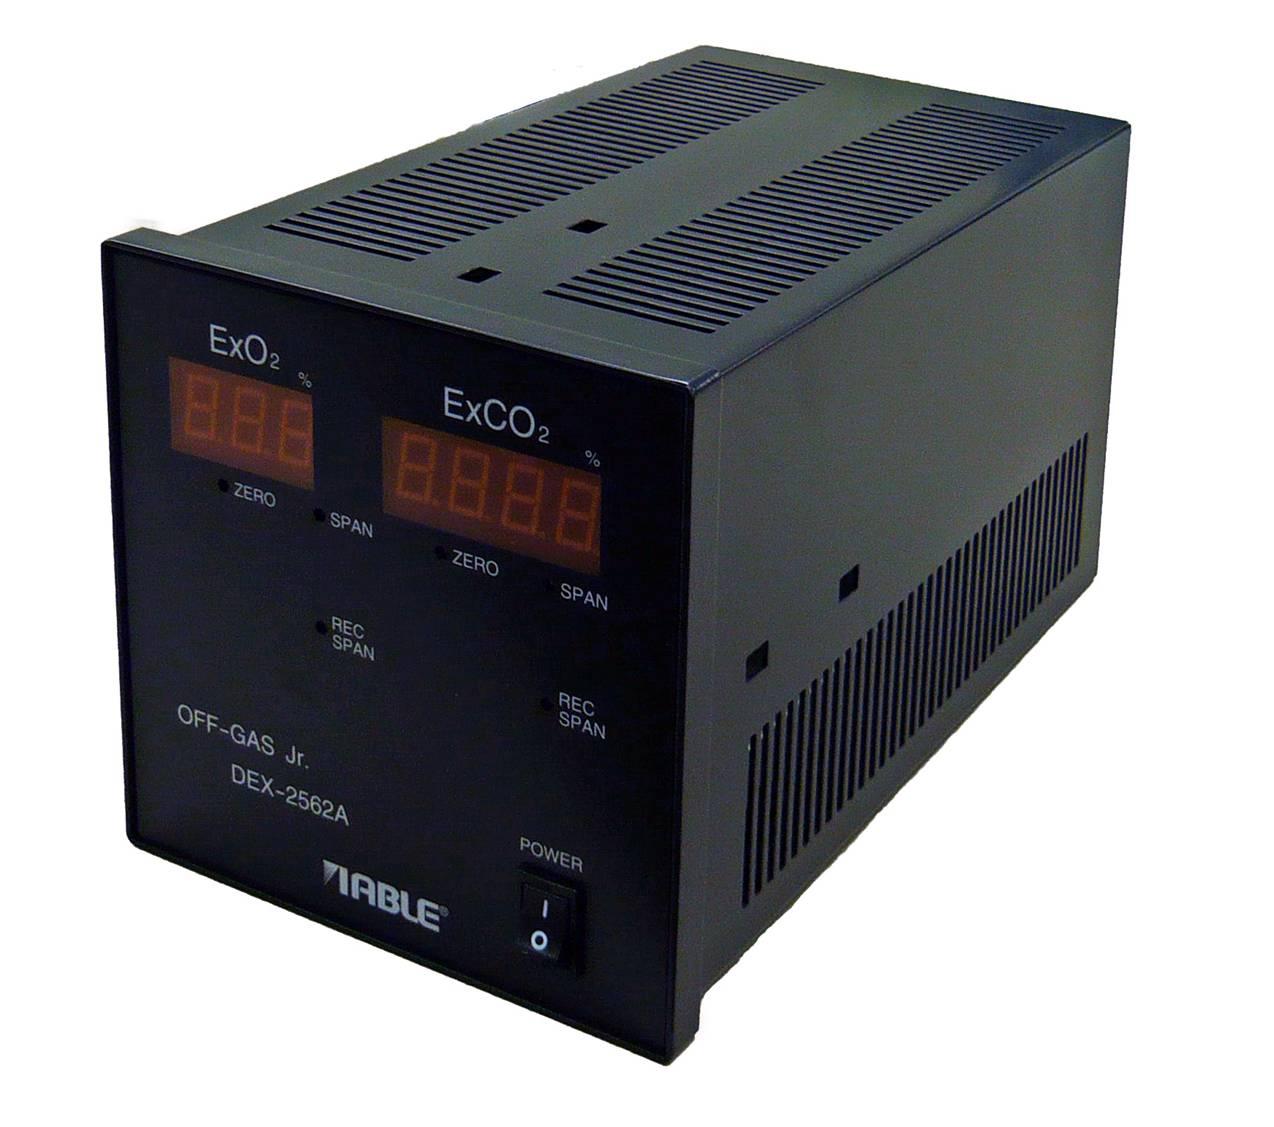 O2/CO2 Analyzer DEX-2562A (OFF-GAS Jr.)